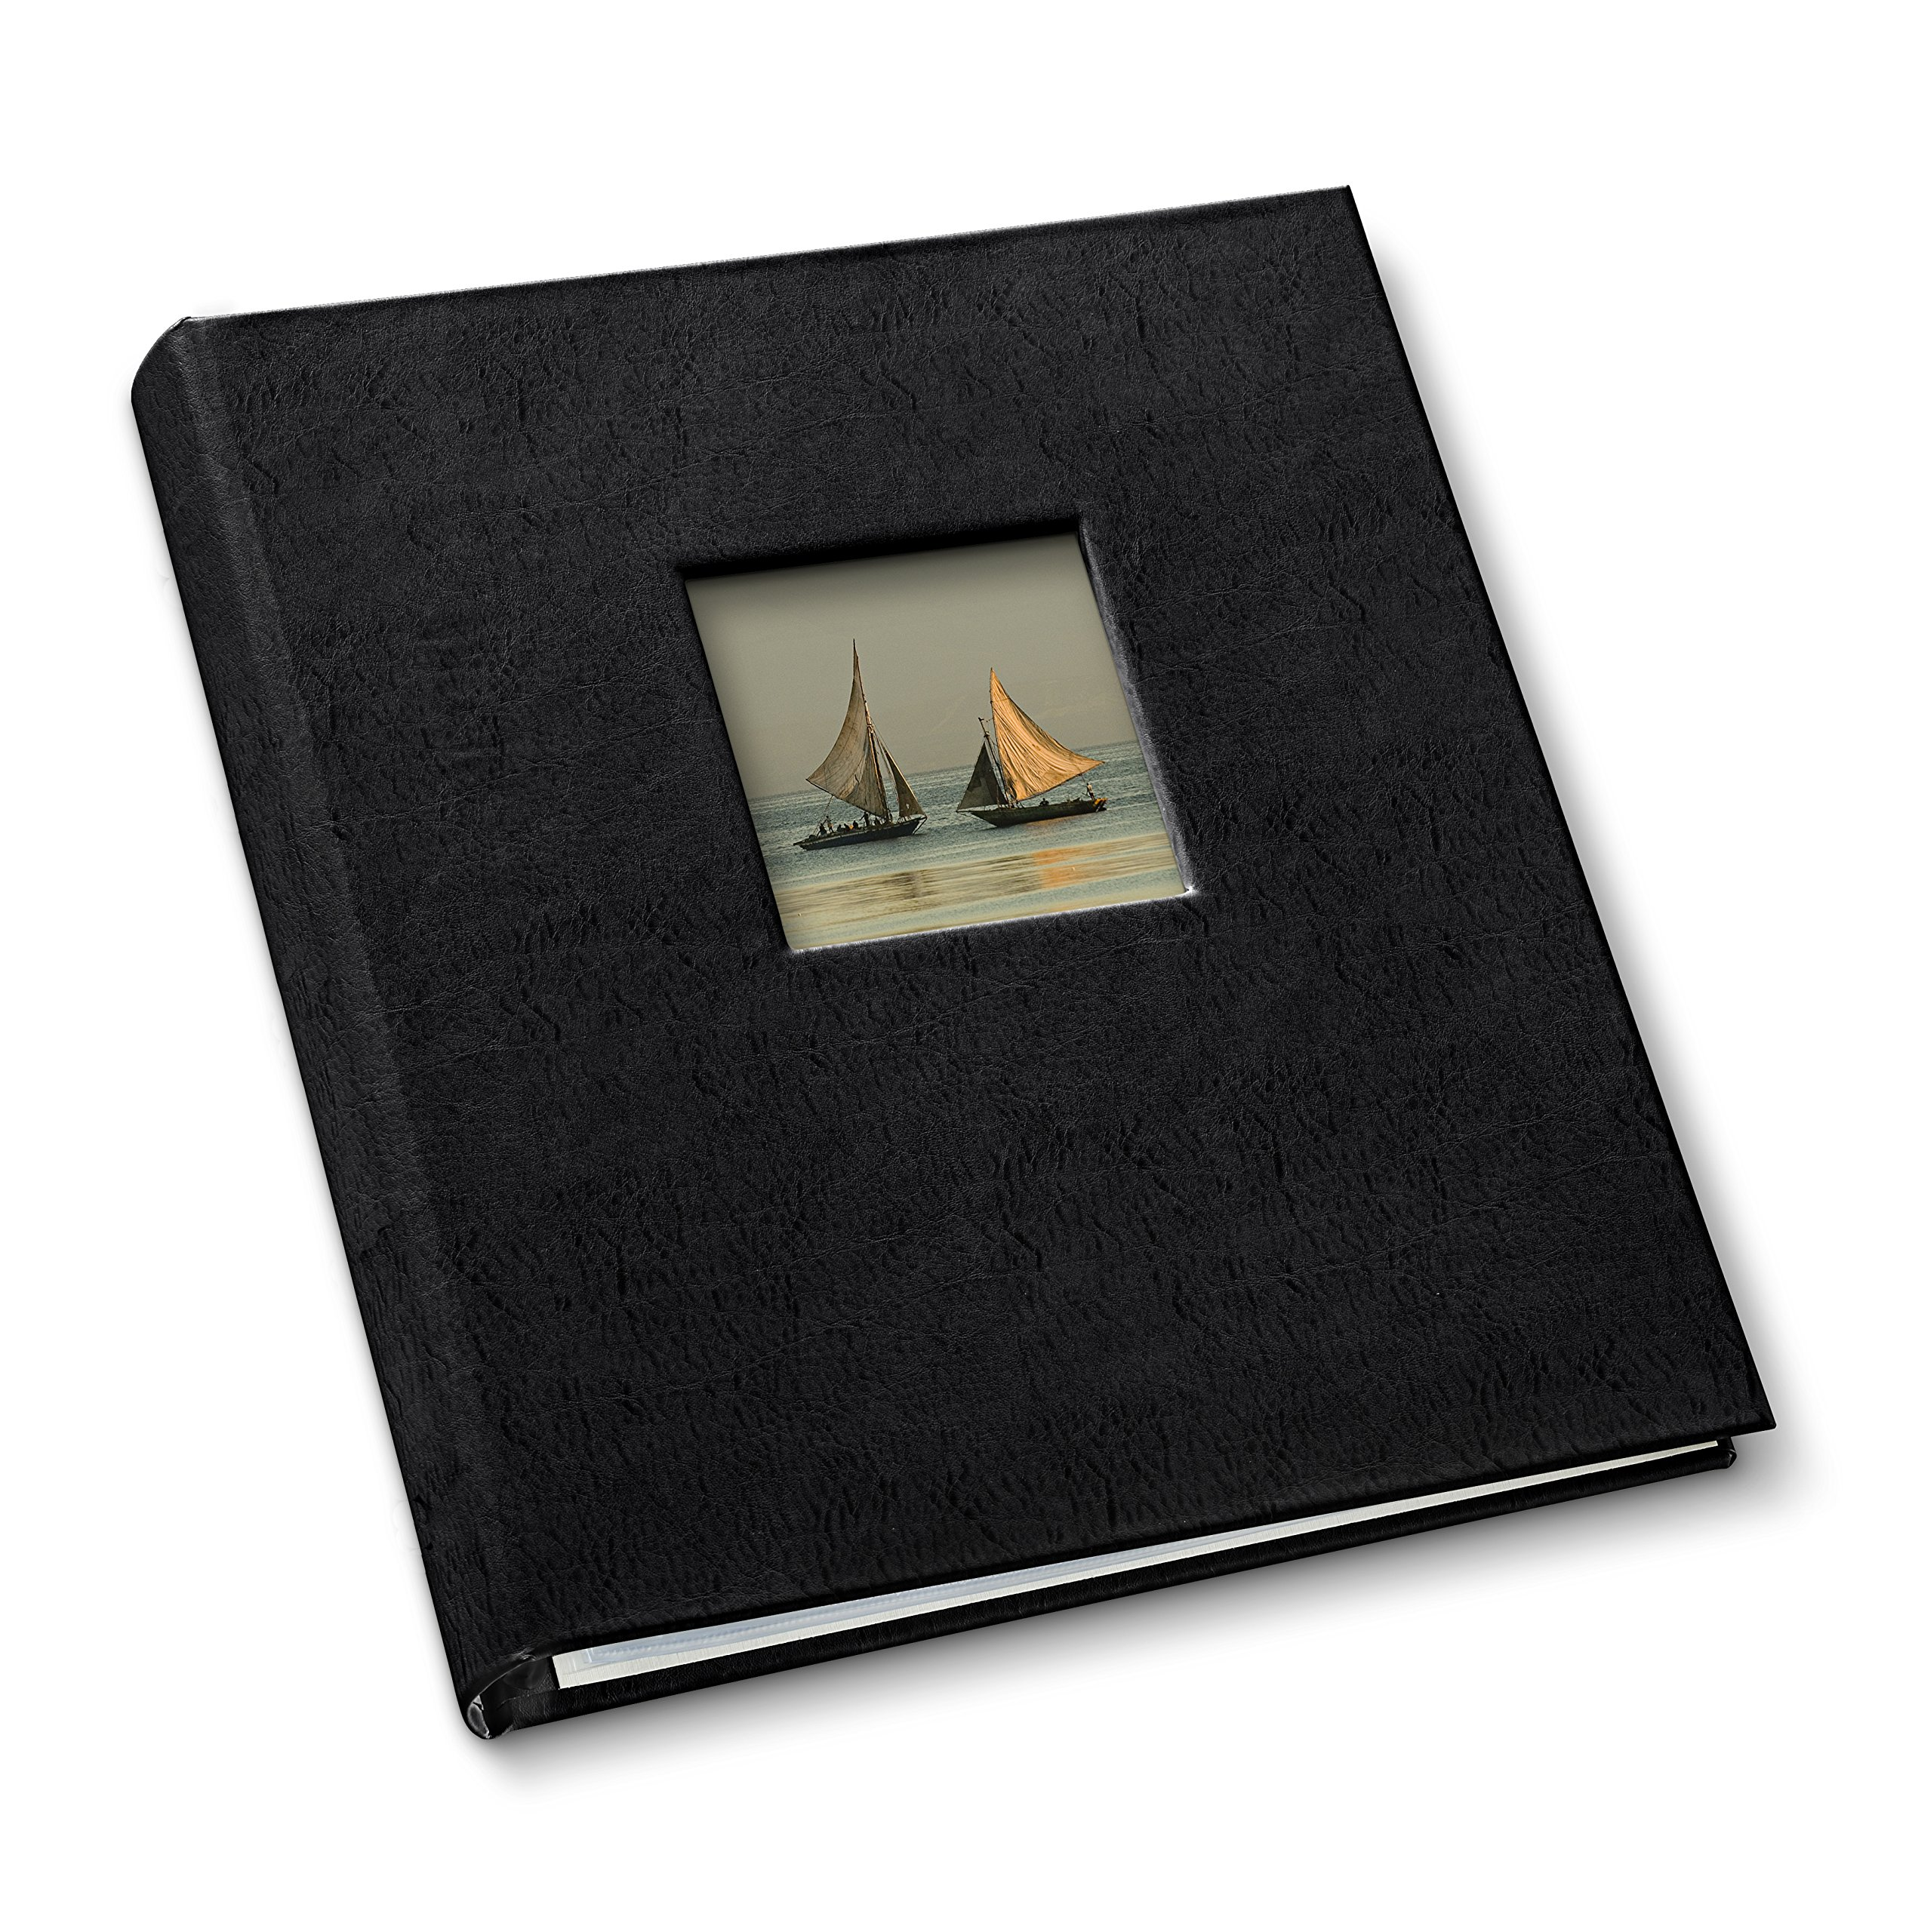 Gallery Leather Presentation Binder 1.25'' With Window Freeport Black